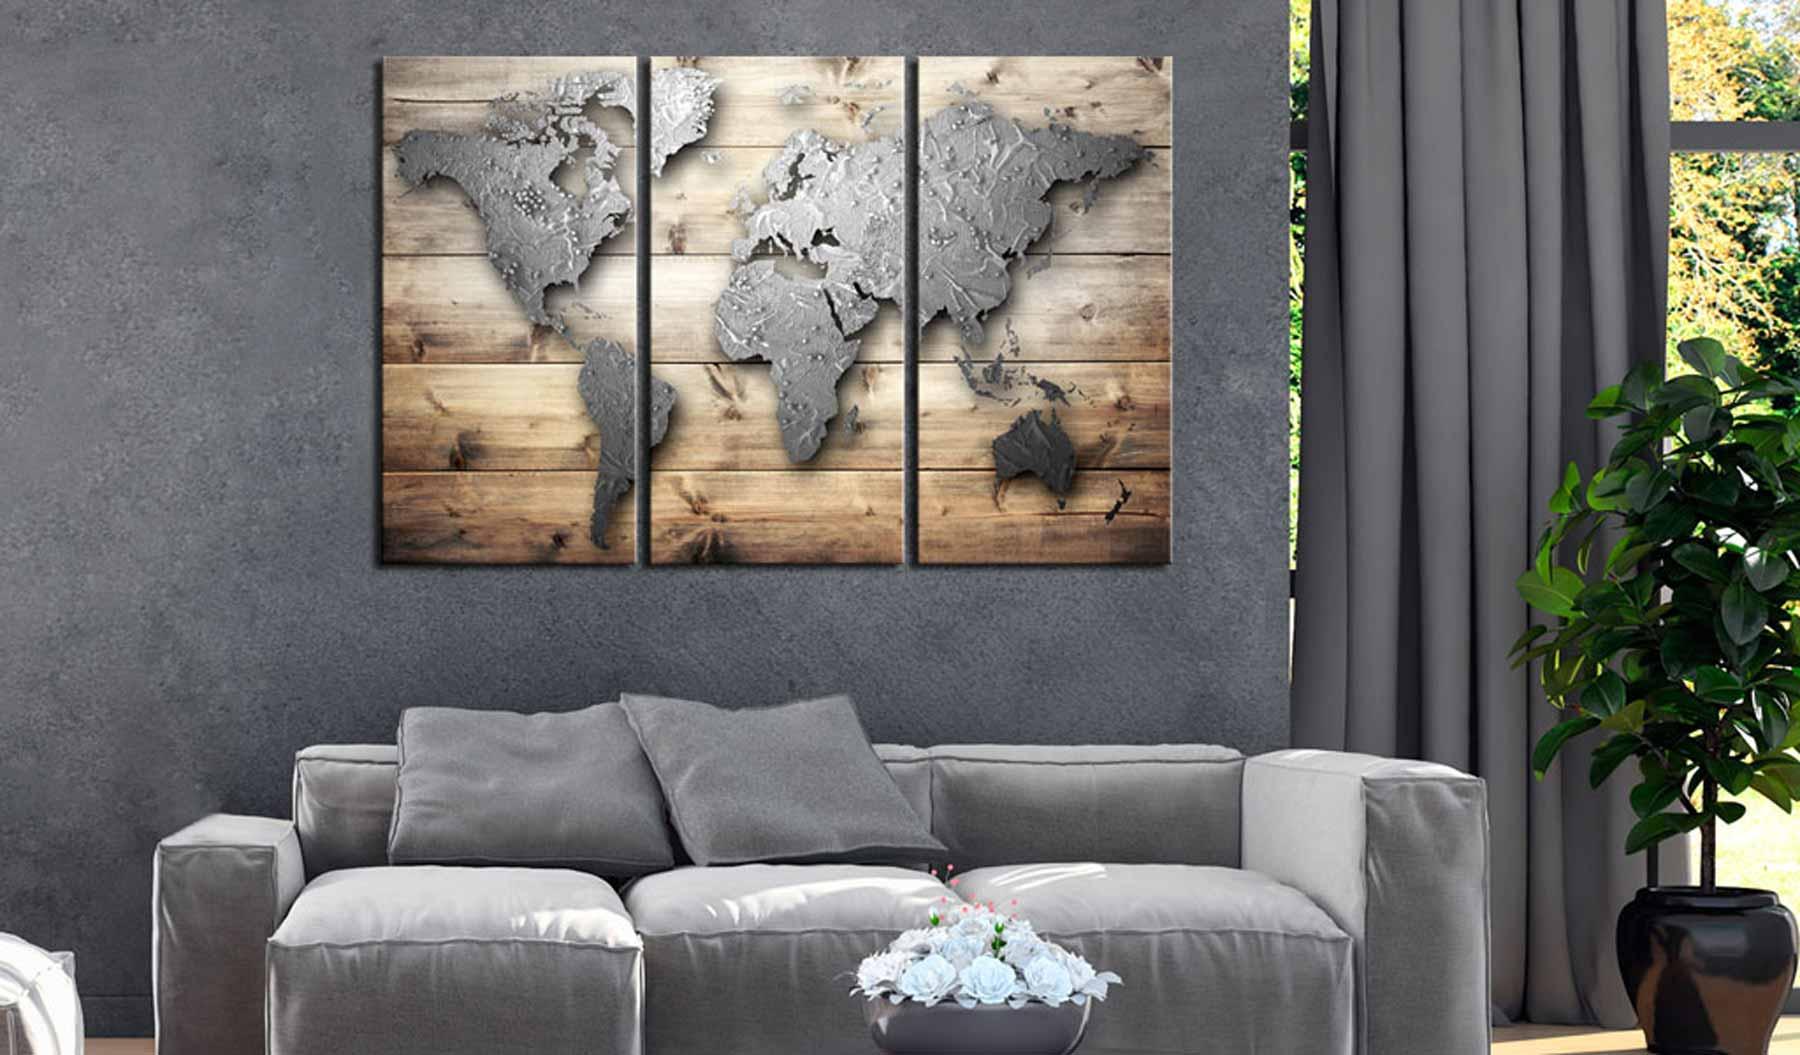 ARTGEIST Doors to the World verdenskort billede - grå/natur print på kork (80x120)